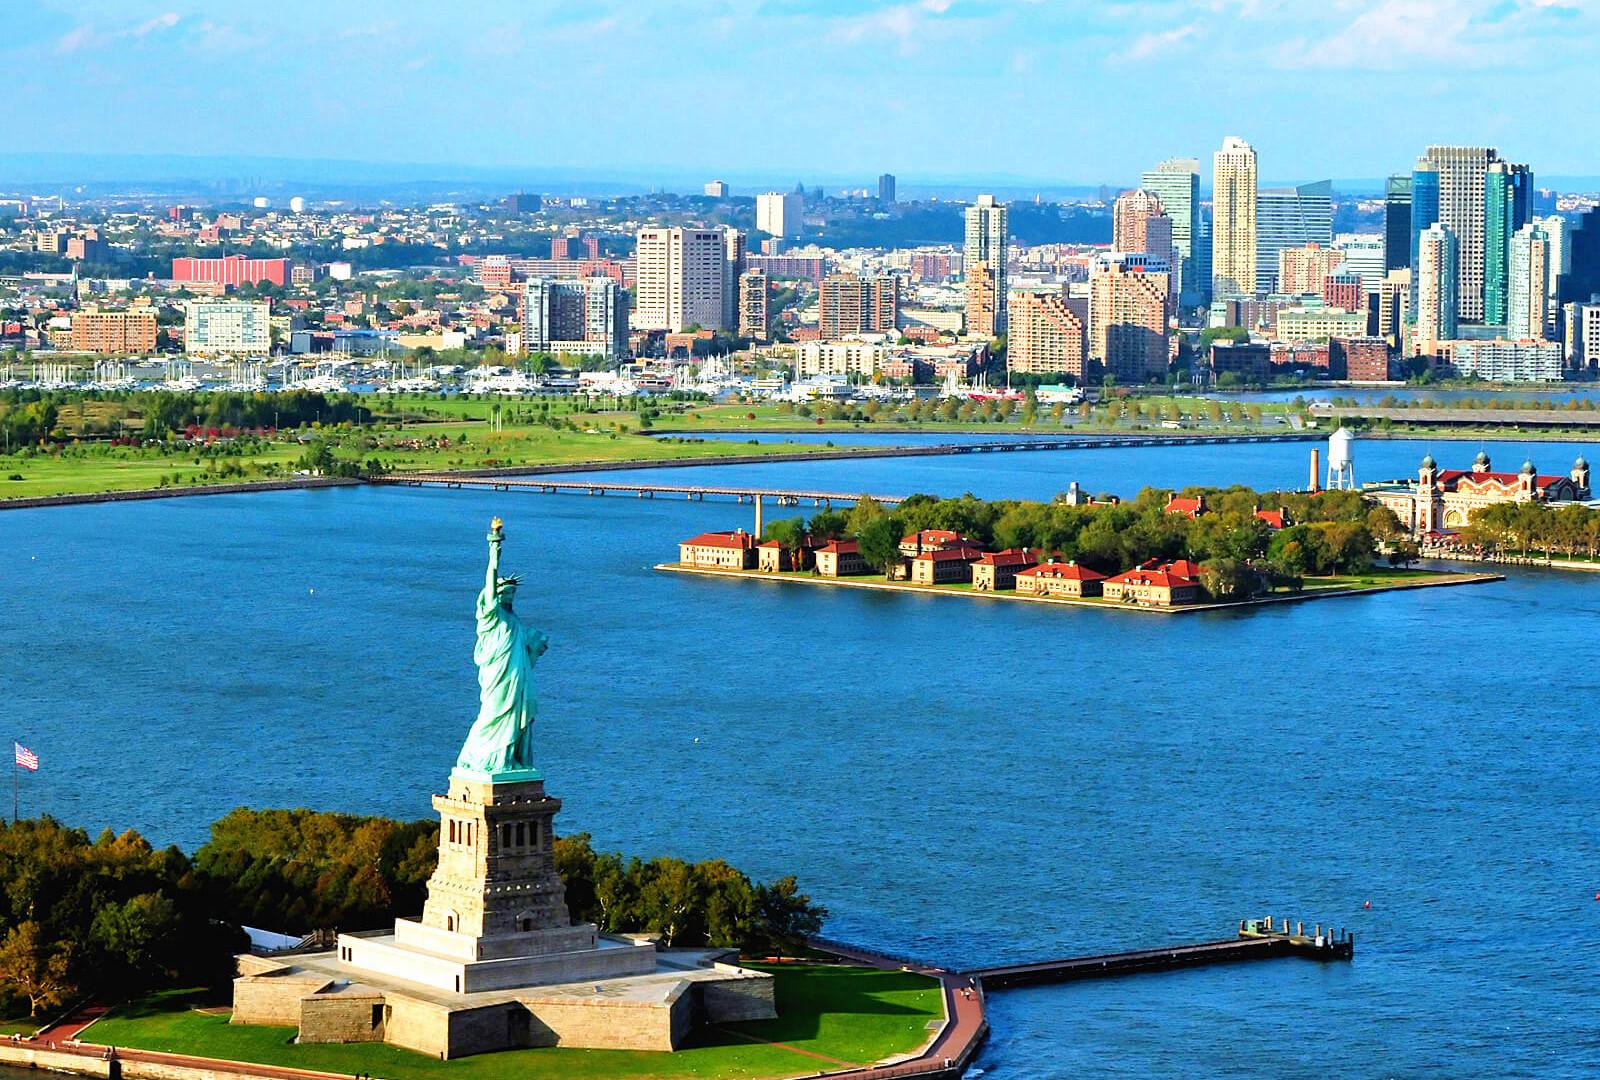 statue of liberty maryland